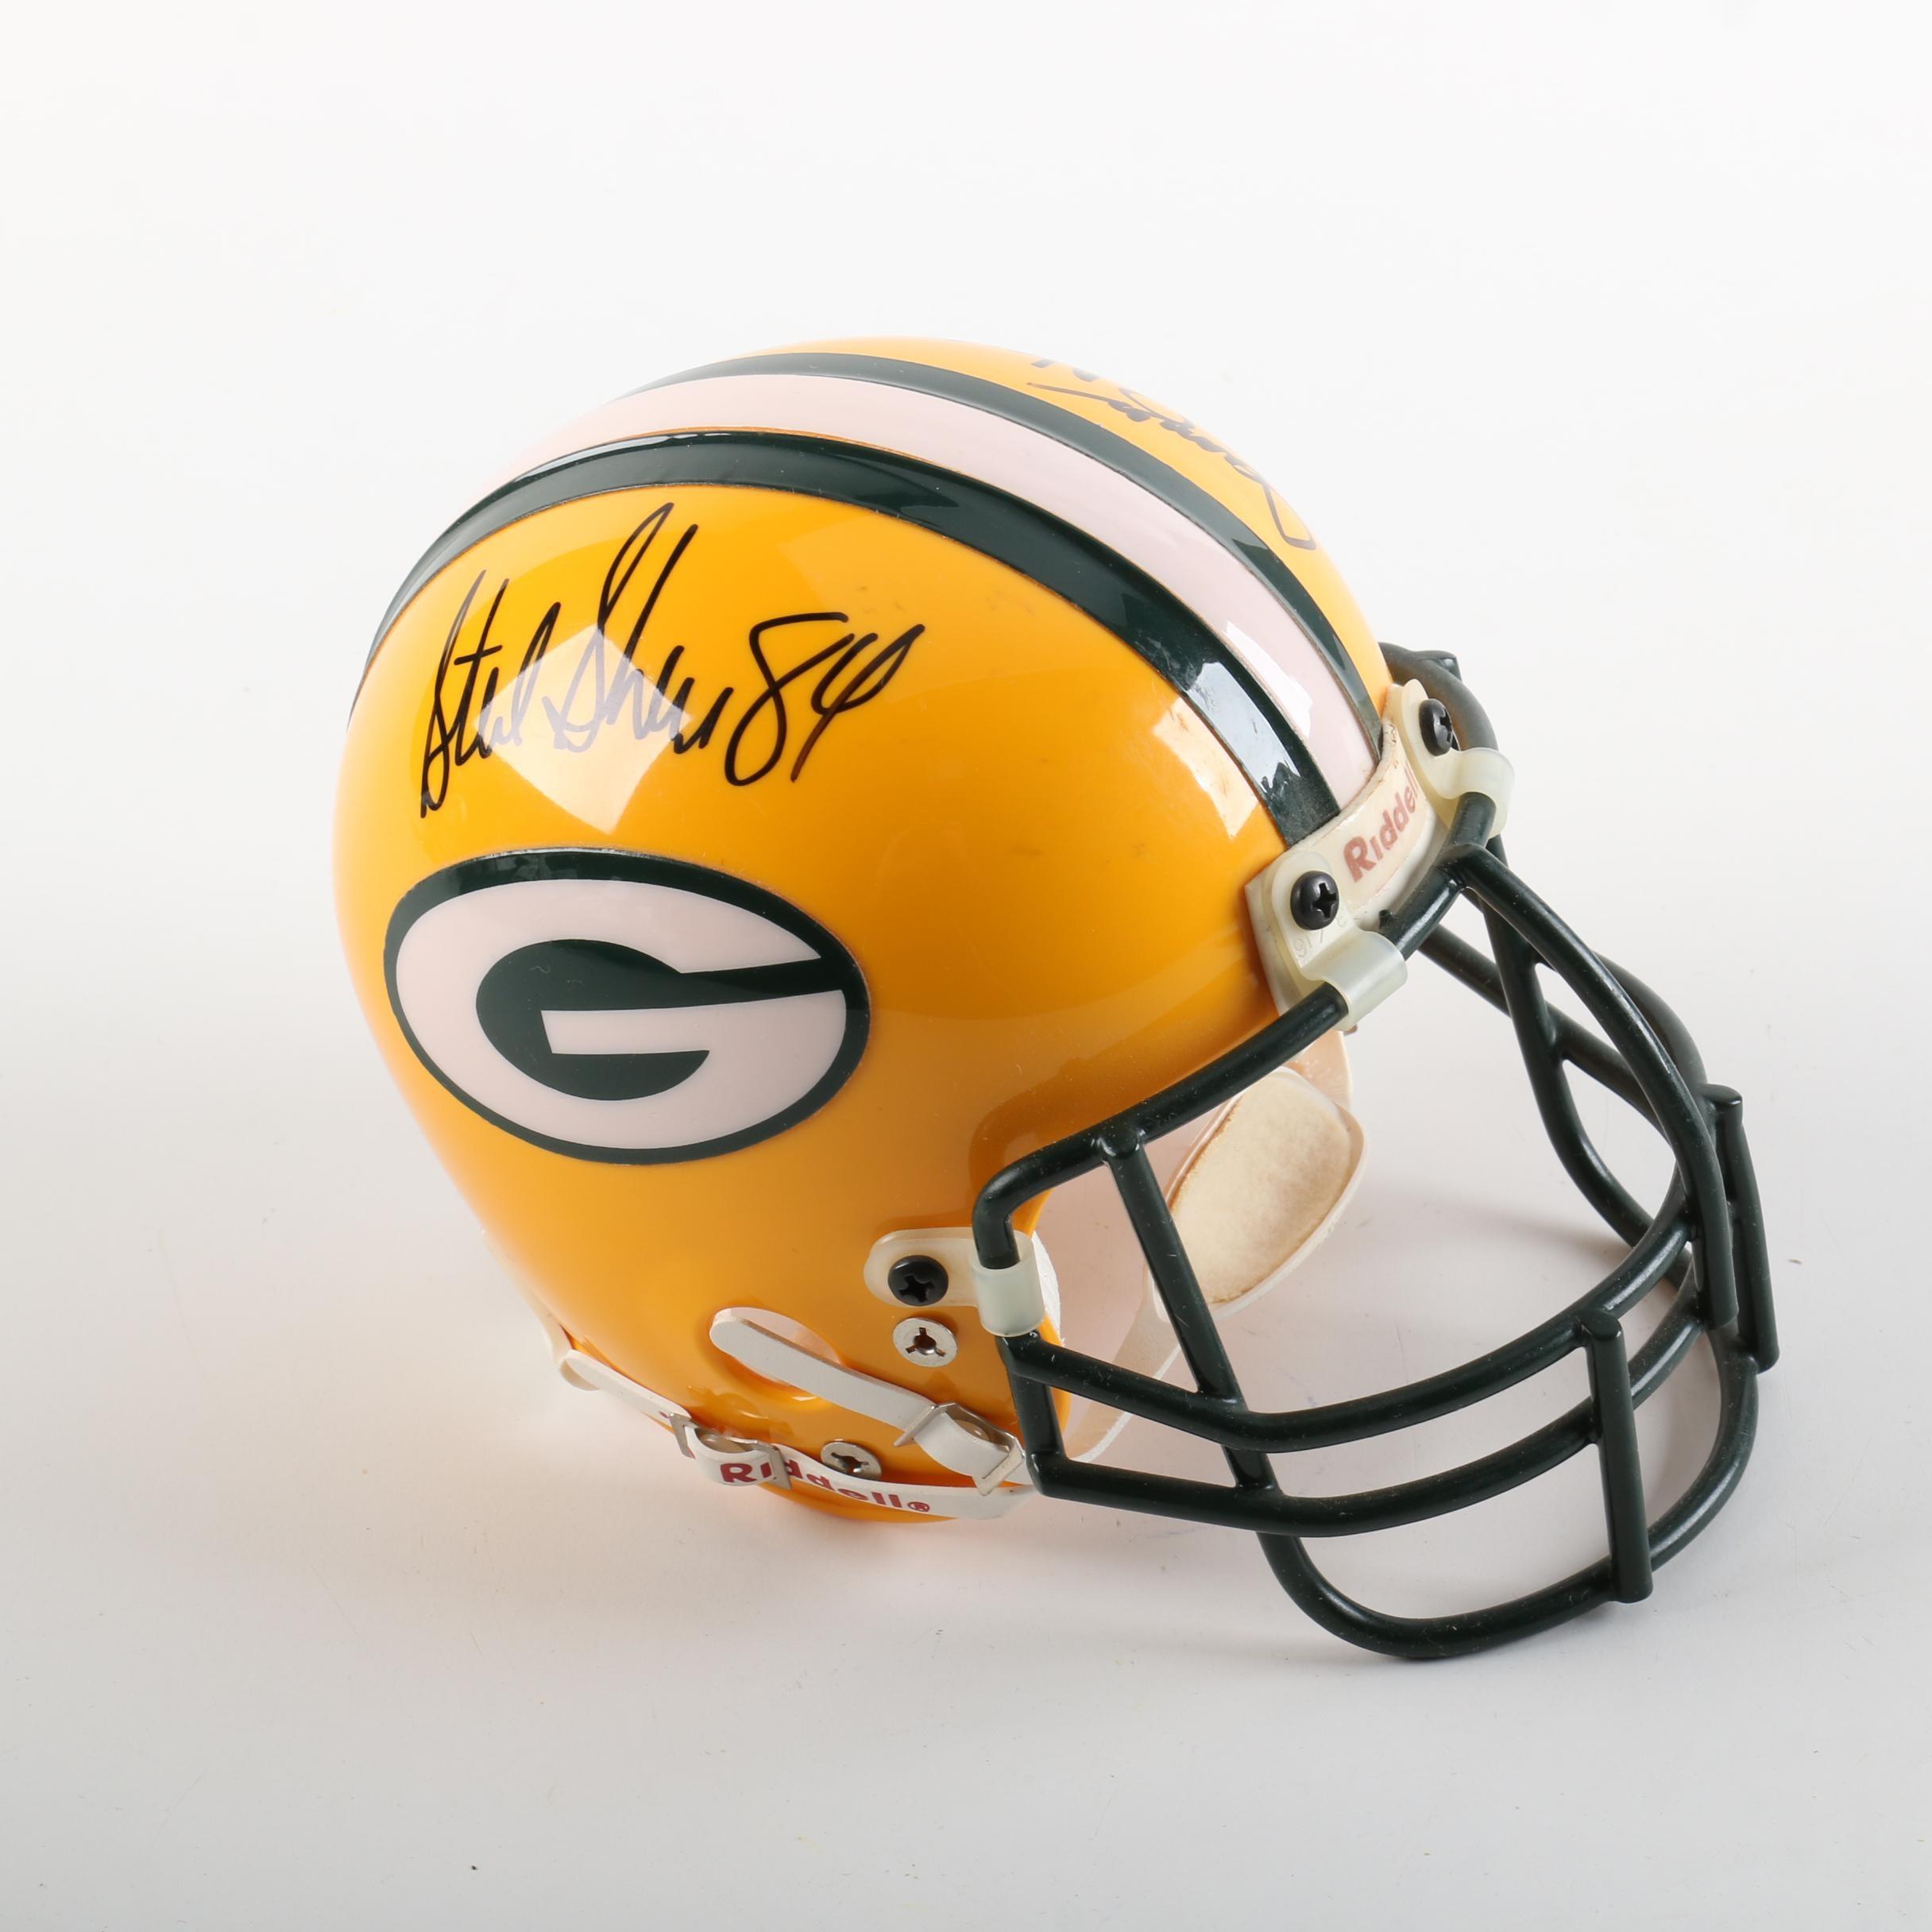 Green Bay Packers Autographed Miniature Helmet